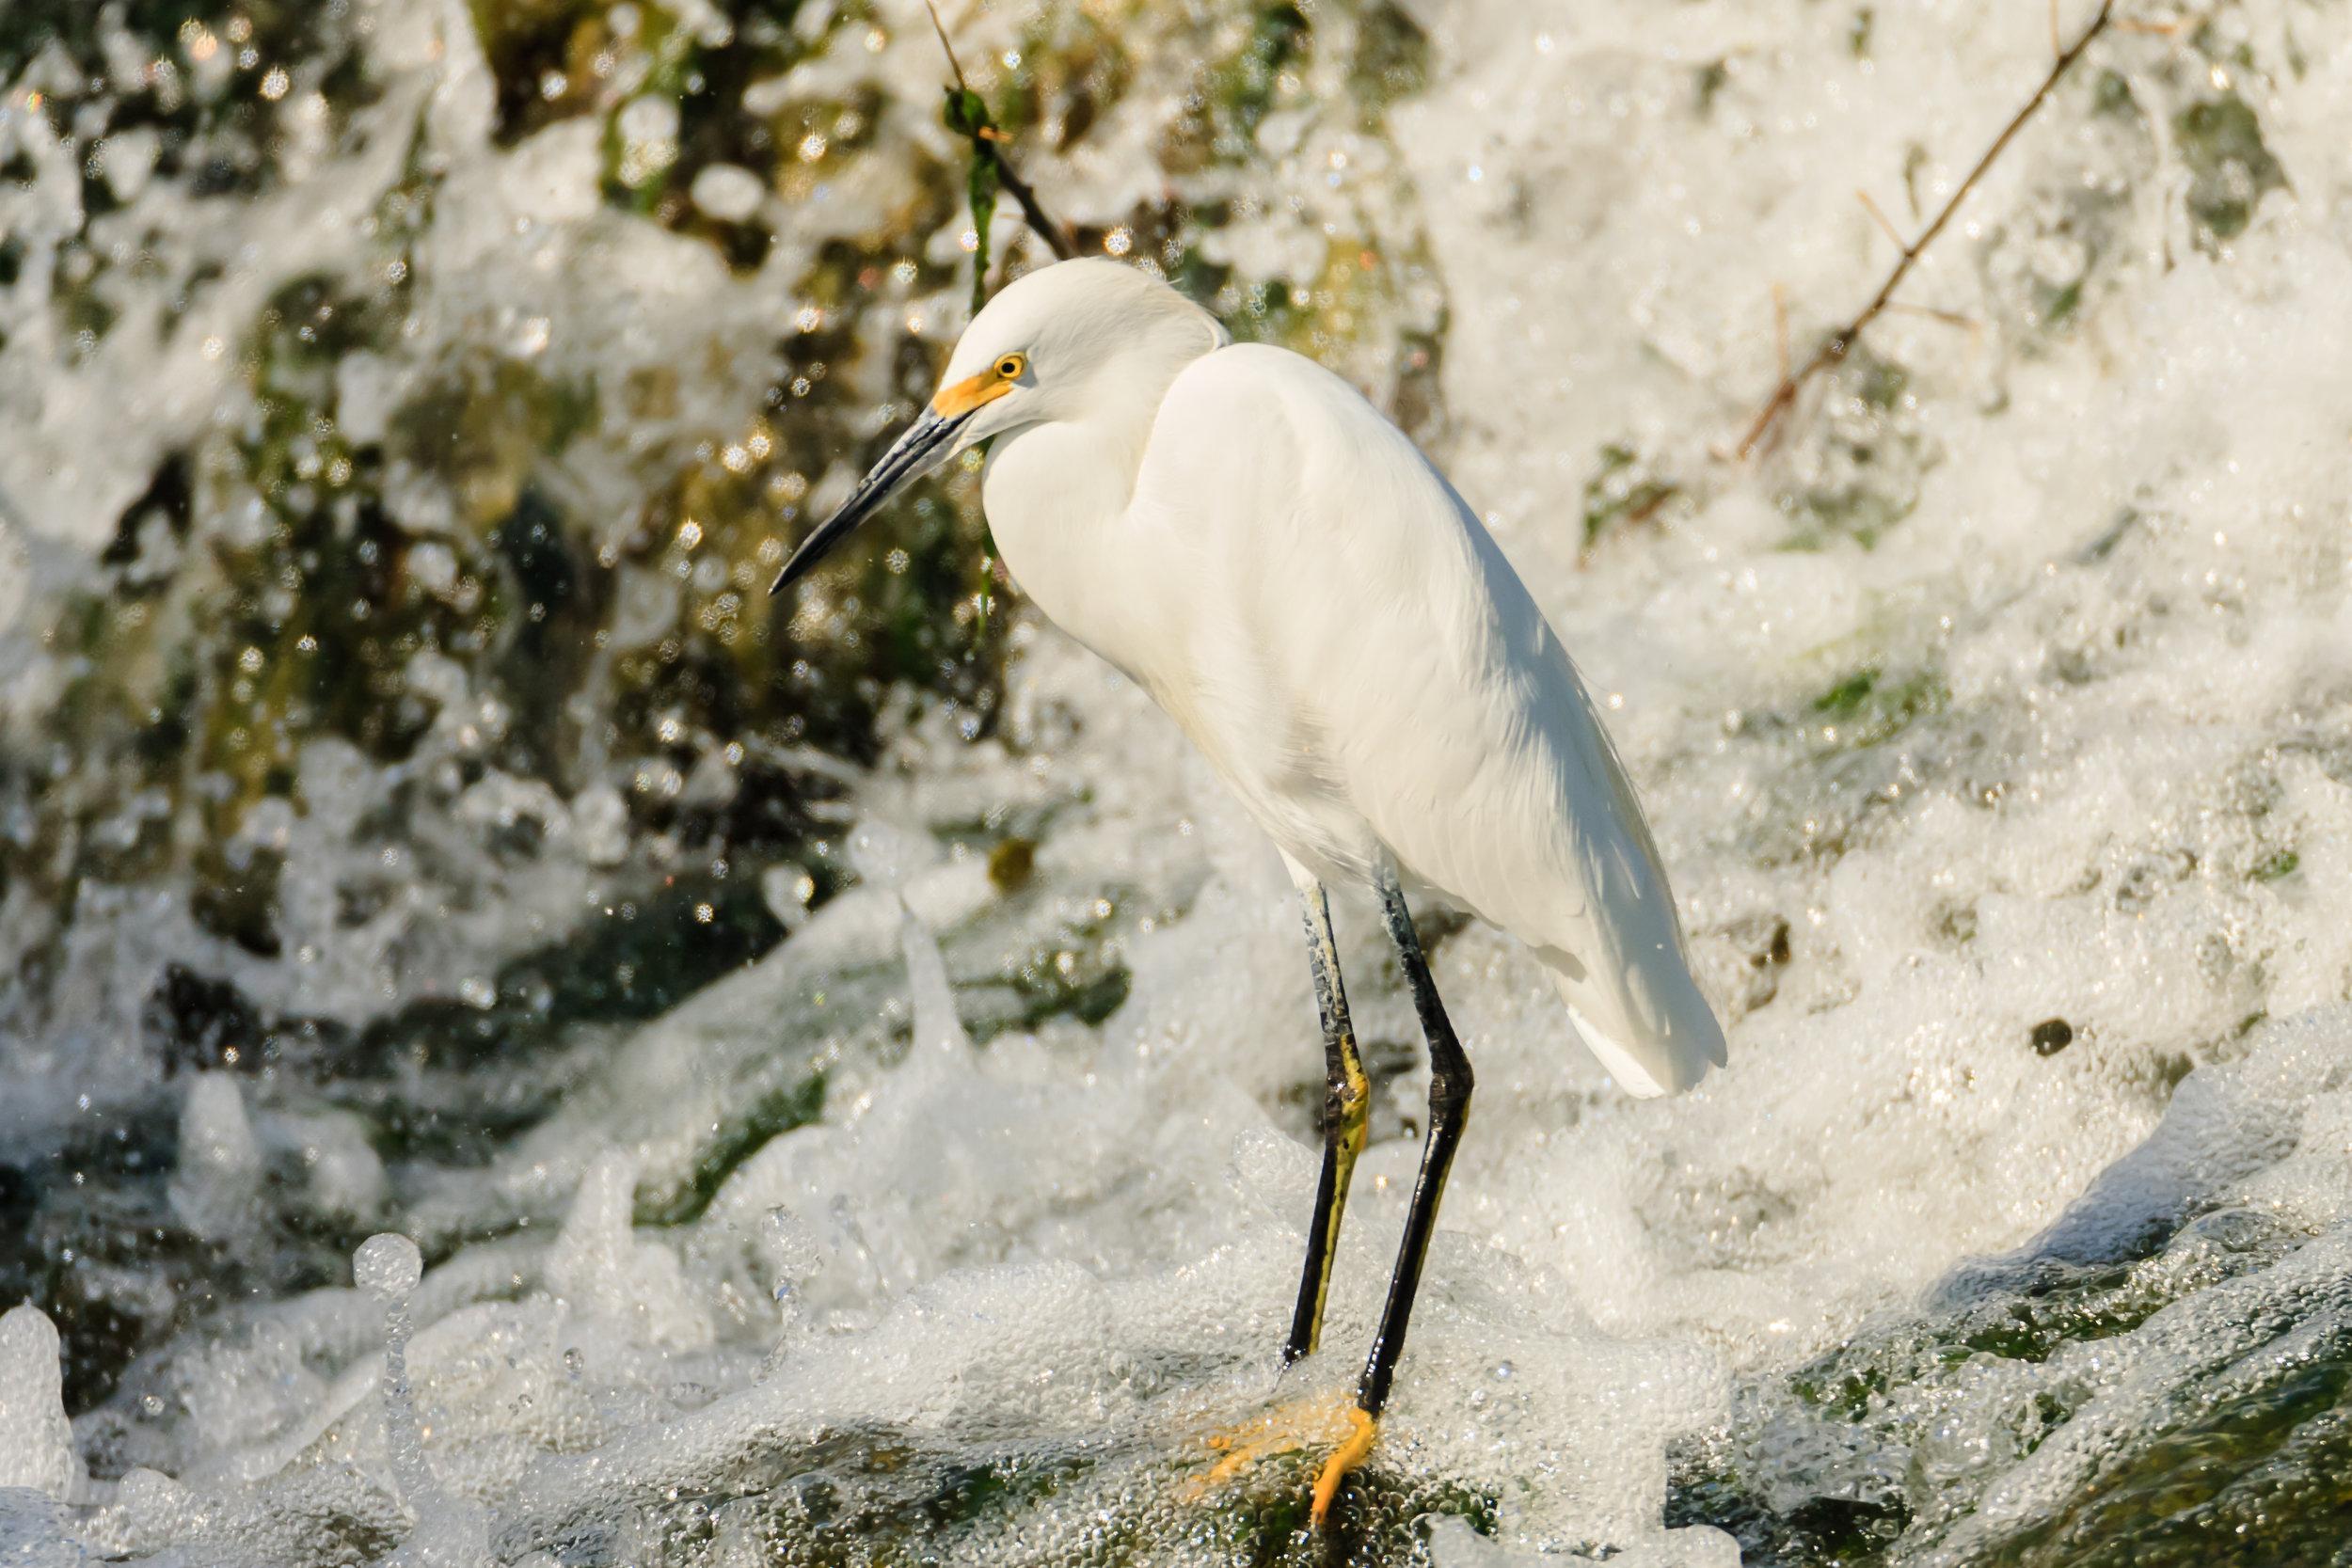 Species: Snowy Egret Photo Credit: Damian Martinez Date: October 2016 Location: Acequia Park